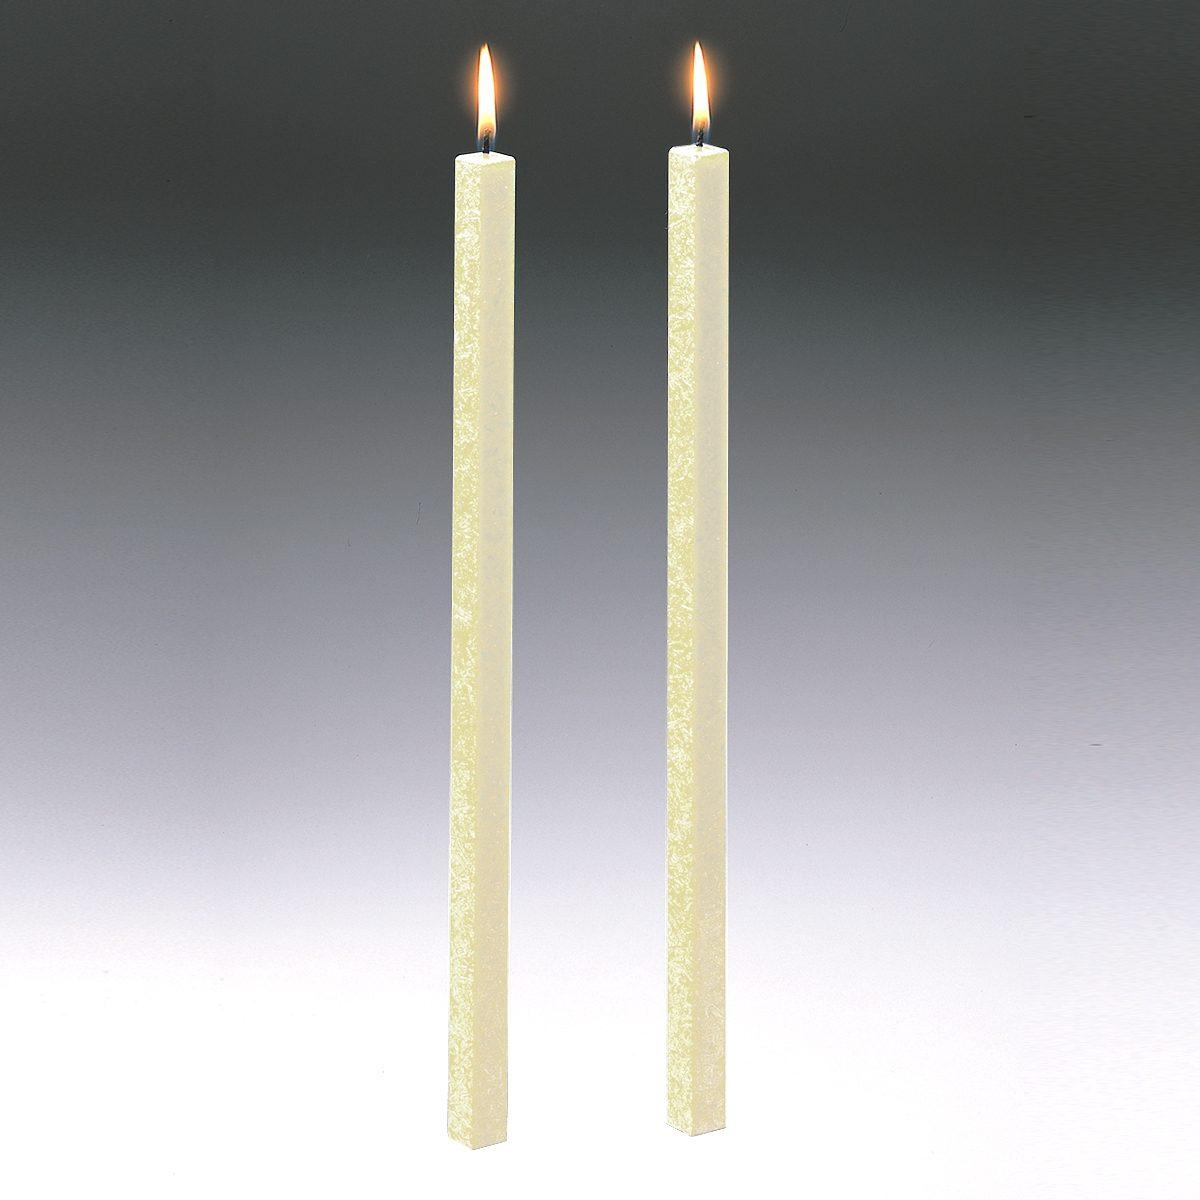 Amabiente Amabiente Kerze CLASSIC elfenbein 40cm - 2er Set